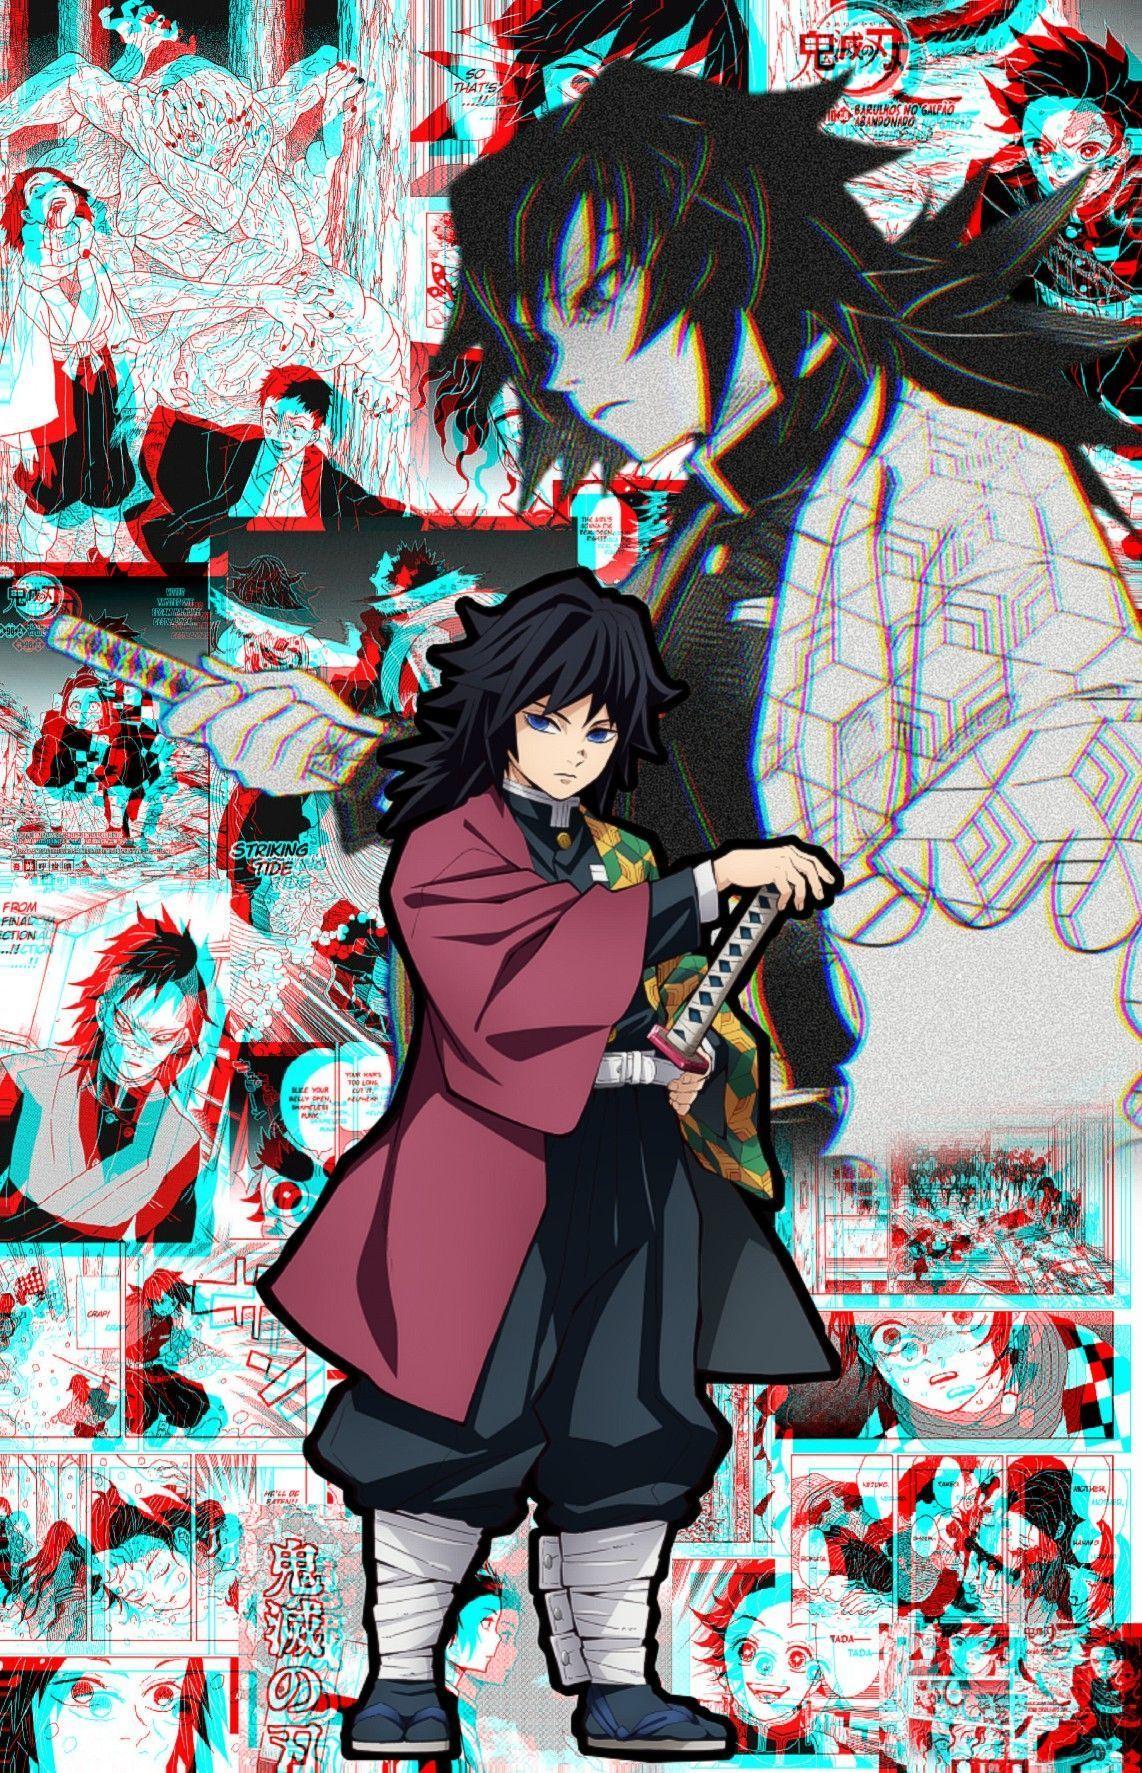 Anime 4k Ps4 Kimetsu No Yaiba Wallpapers - Wallpaper Cave